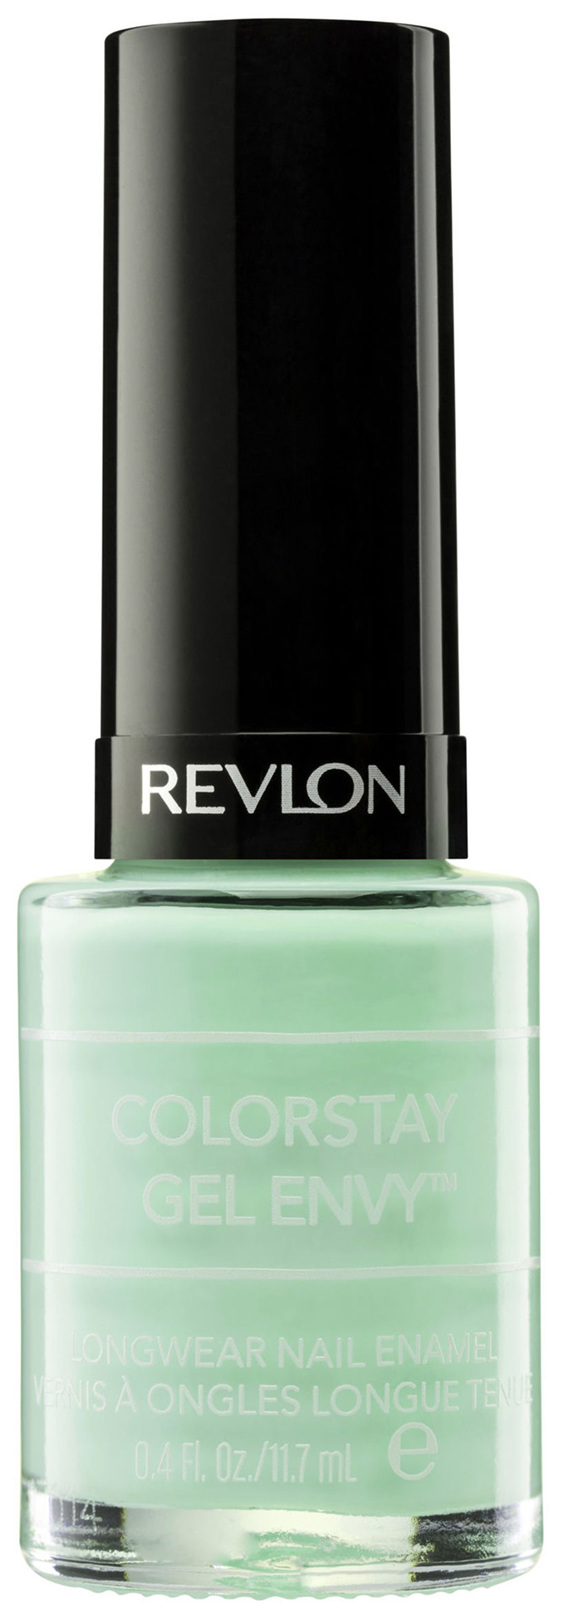 Revlon Colorstay Gel Envy™ Nail Enamel Cha-Ching